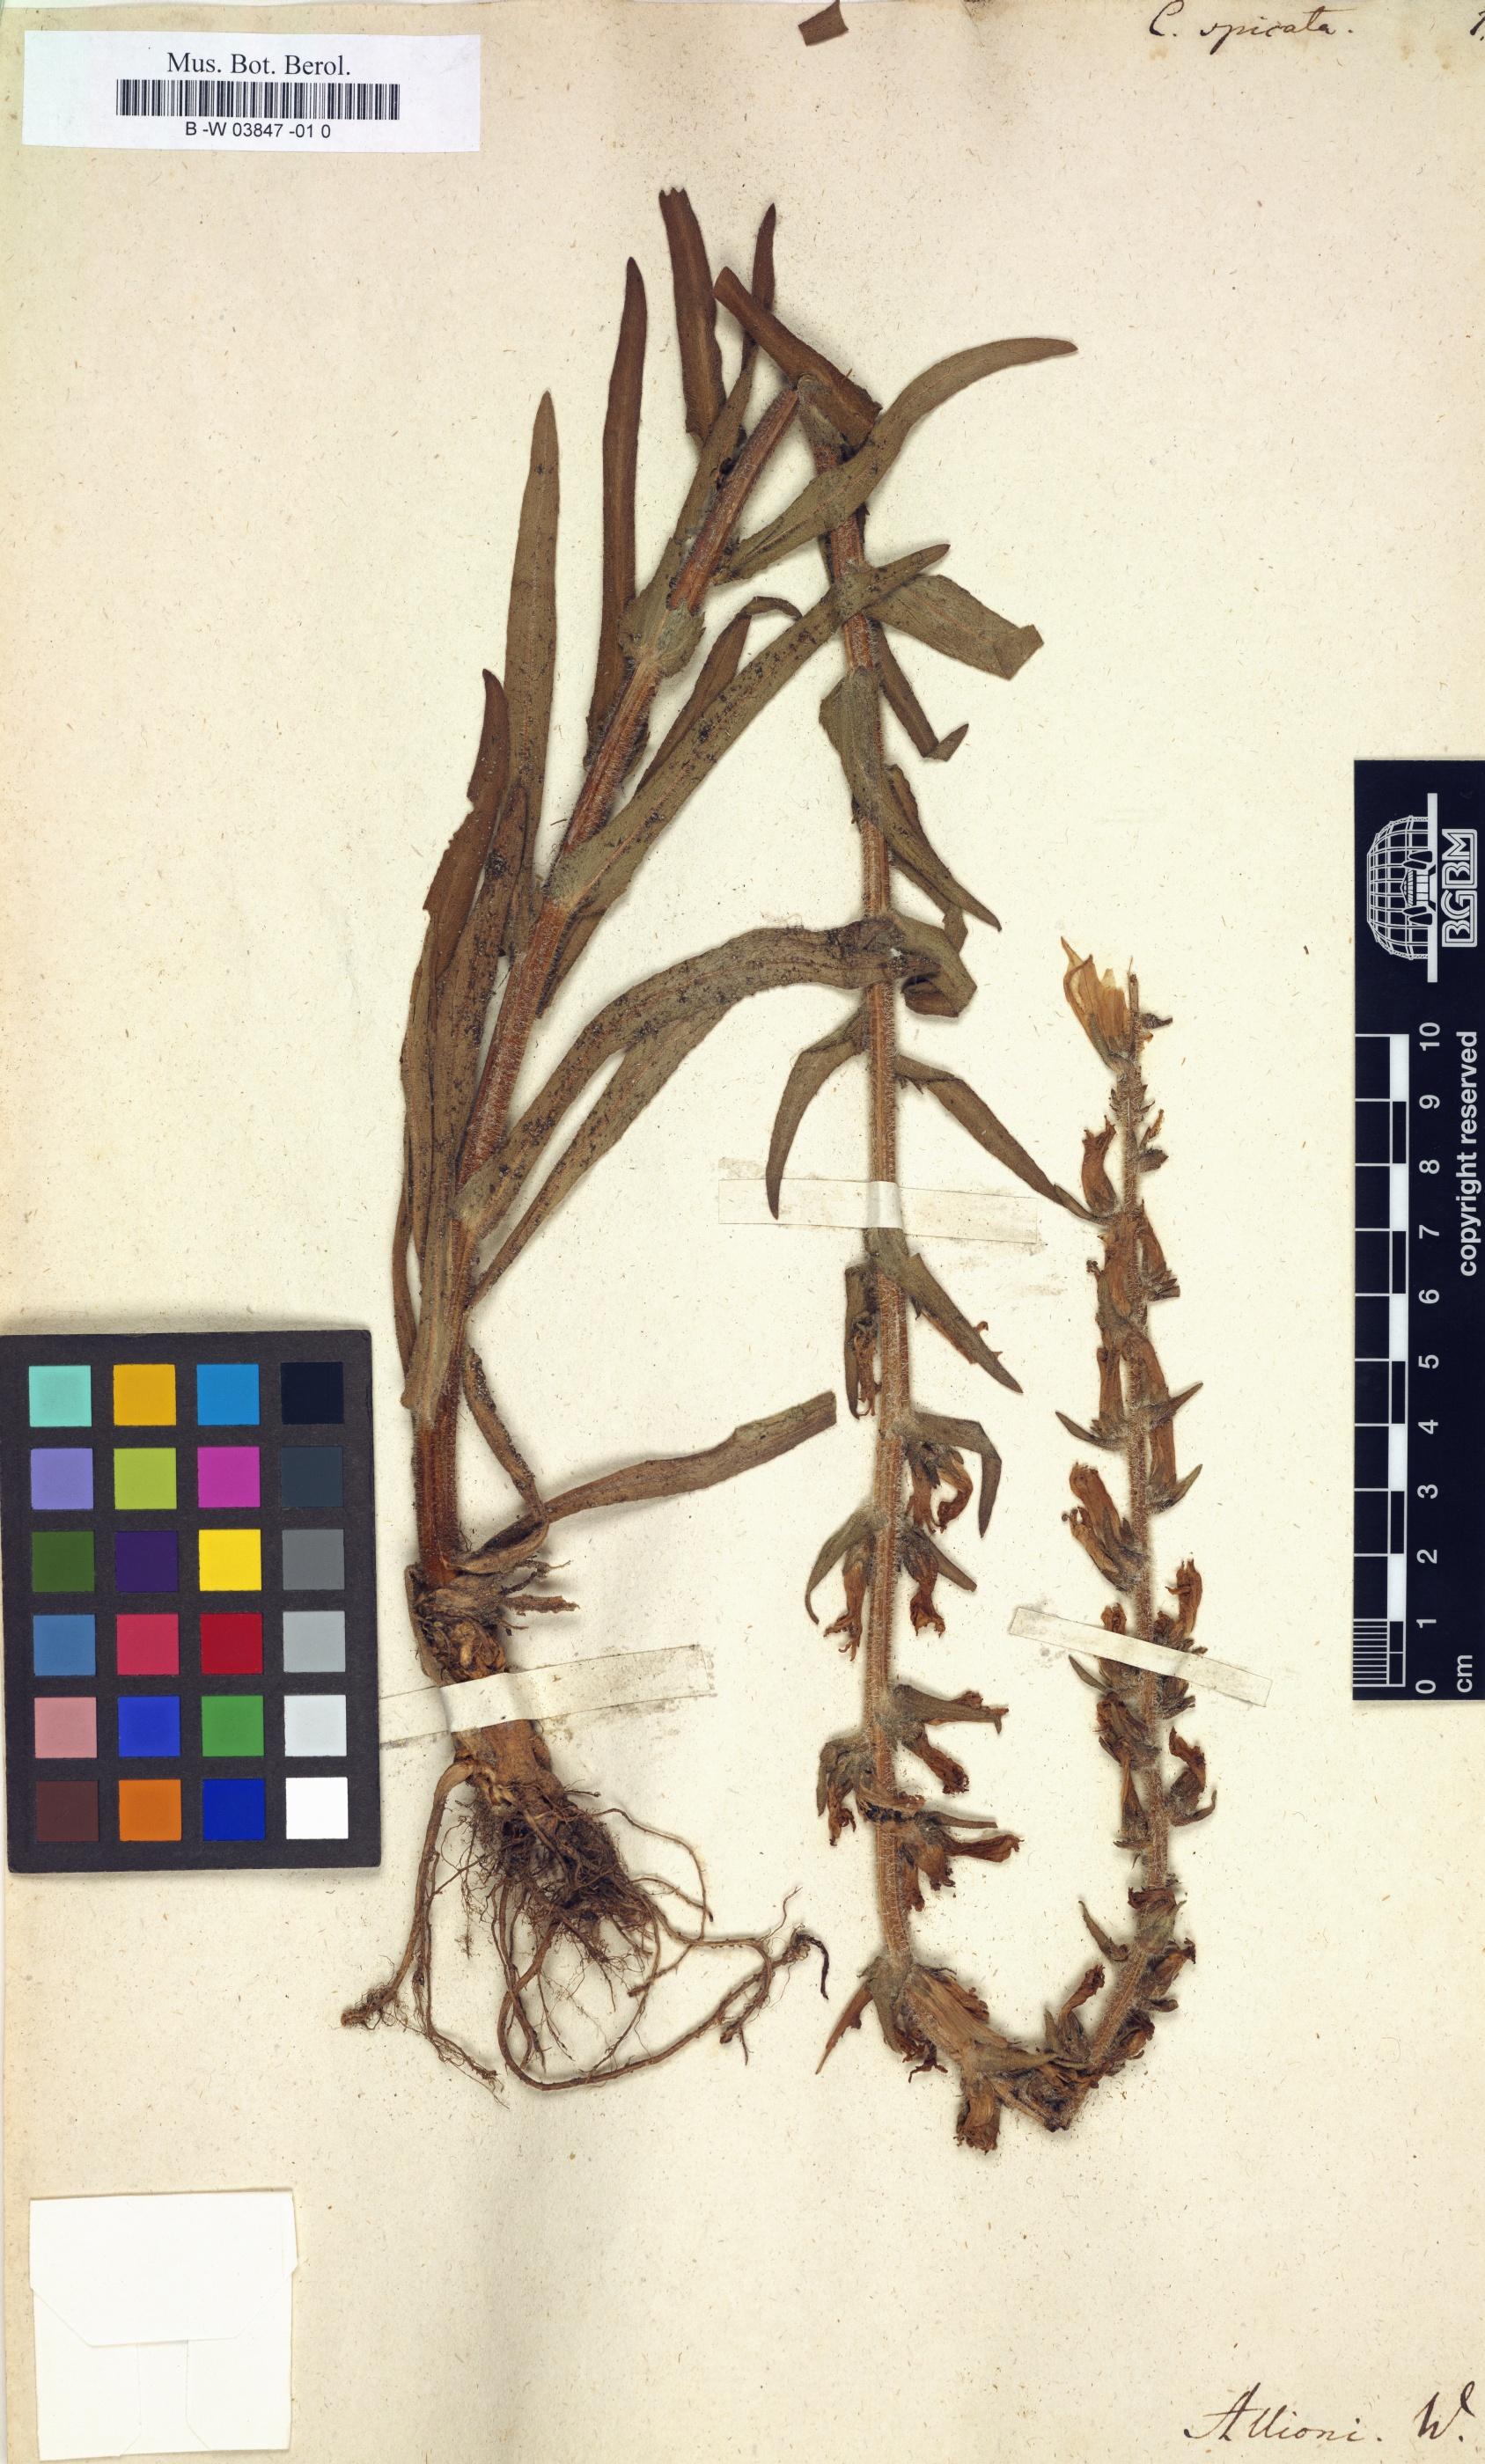 http://ww2.bgbm.org/herbarium/images/B/-W/03/84/B_-W_03847%20-01%200.jpg